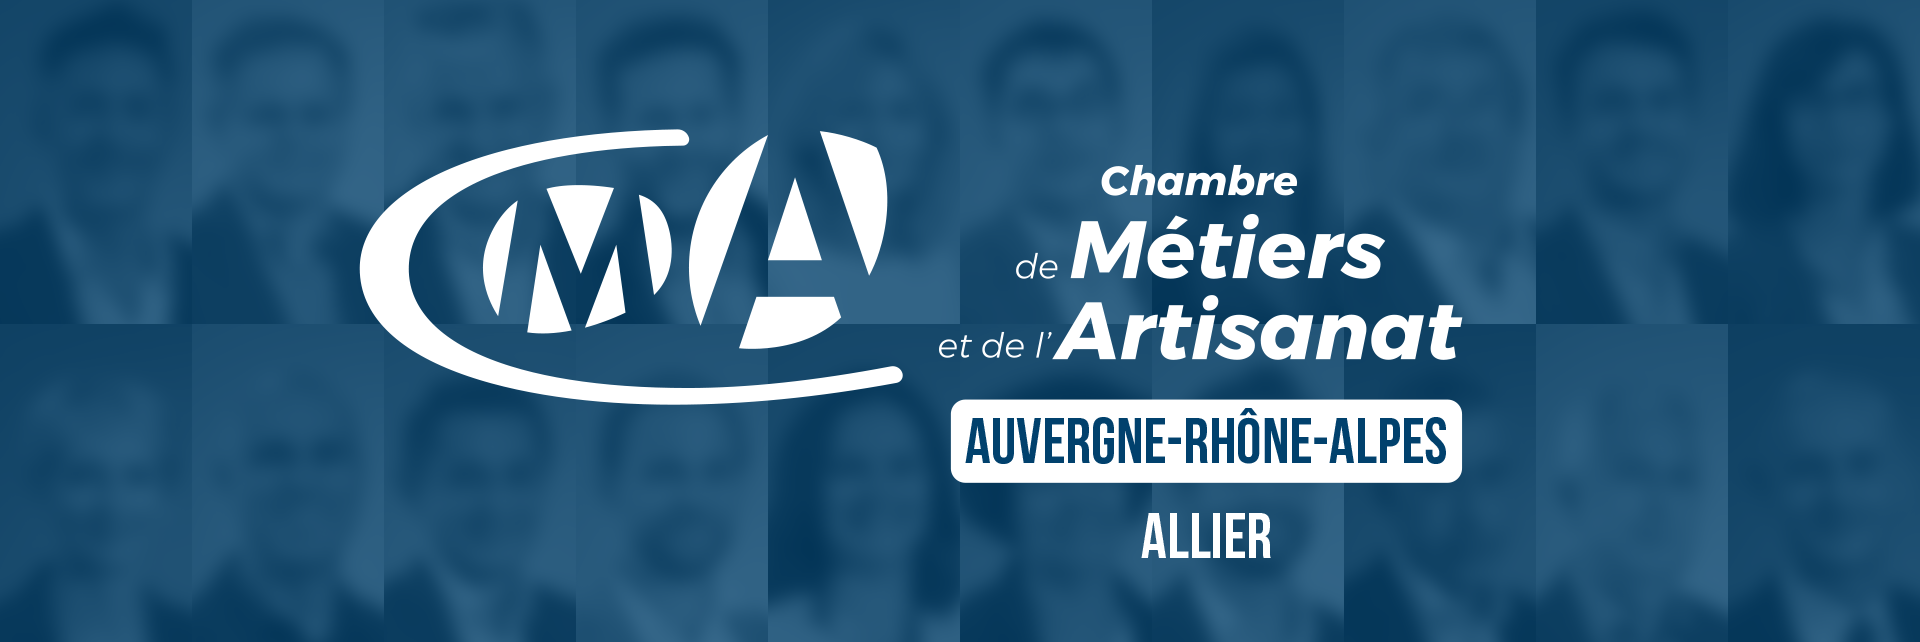 cma auvergne-rhône-alpes équipe de direction CMA Allier